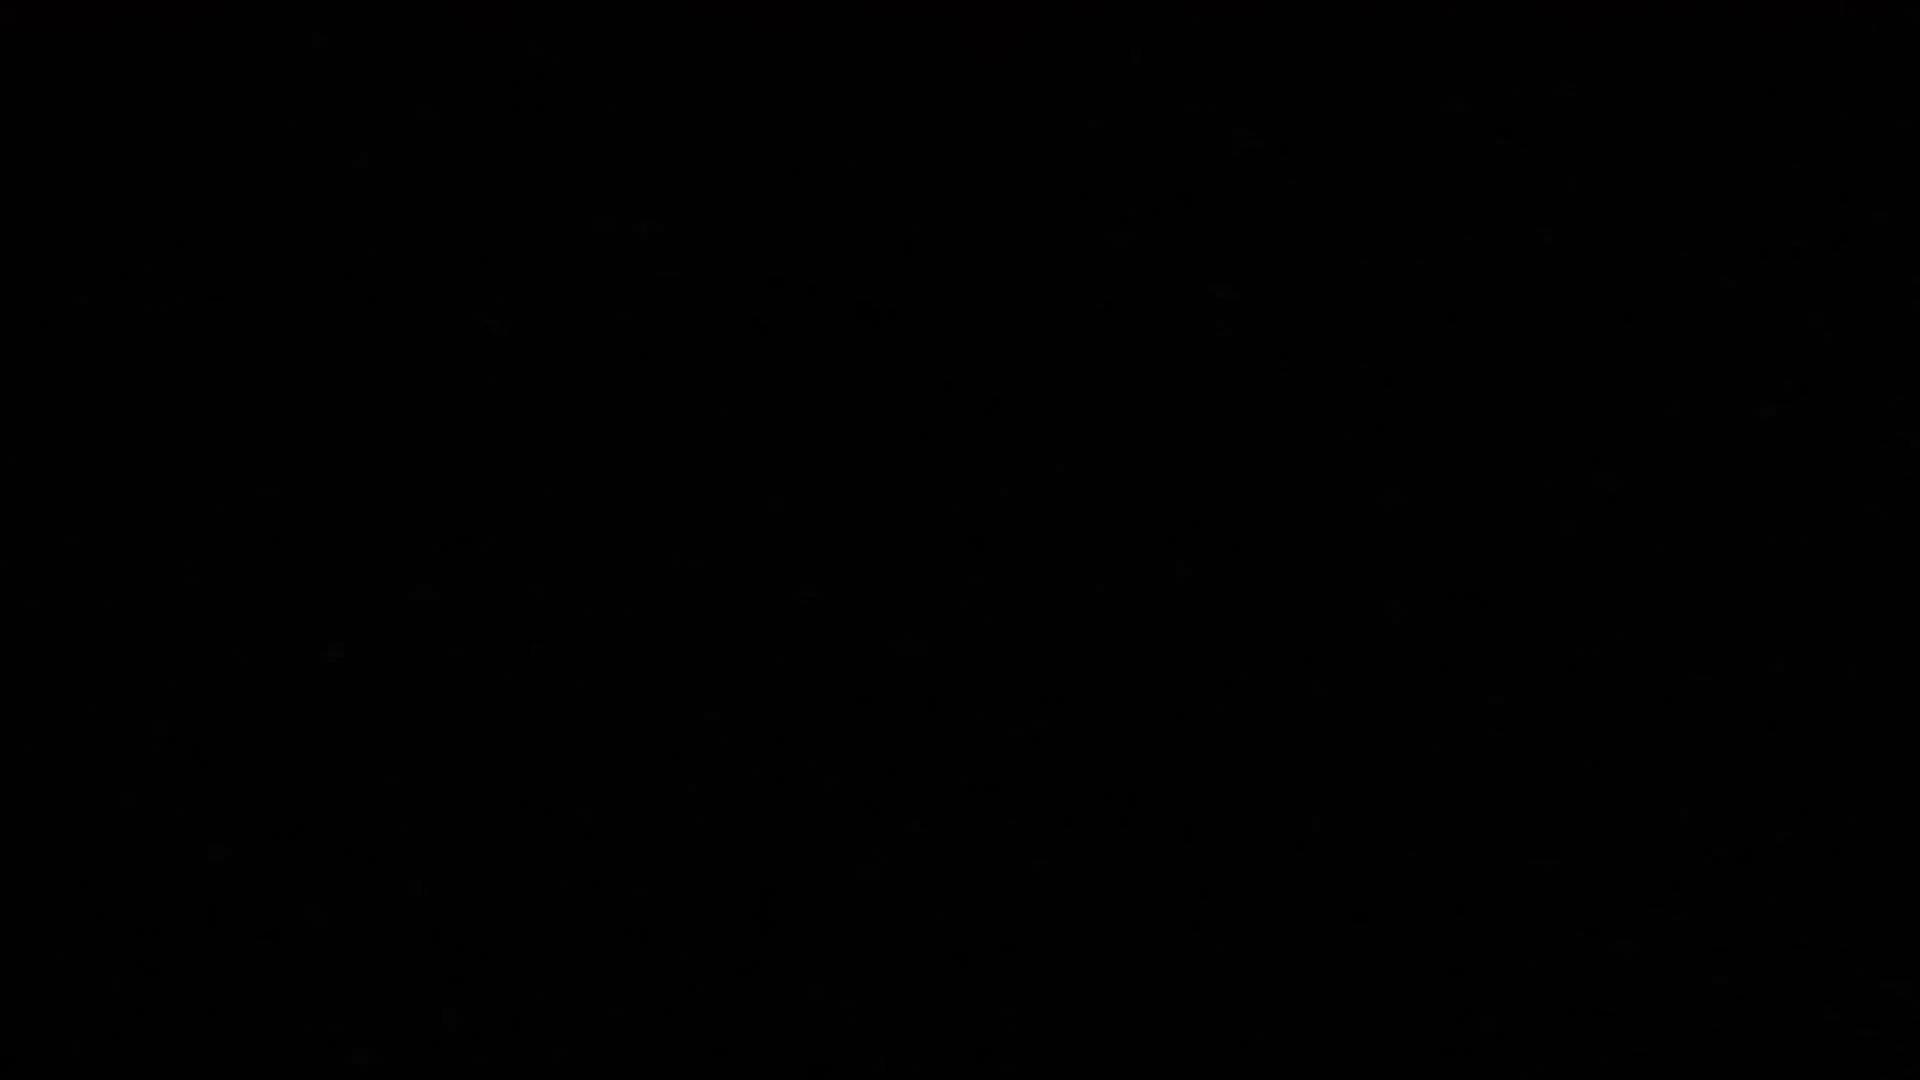 SPYさん初投稿!マンション覗き!5000K!ハイビジョン撮影VOL.05(元サッカー部員社会人) スポーツマン  38pic 4